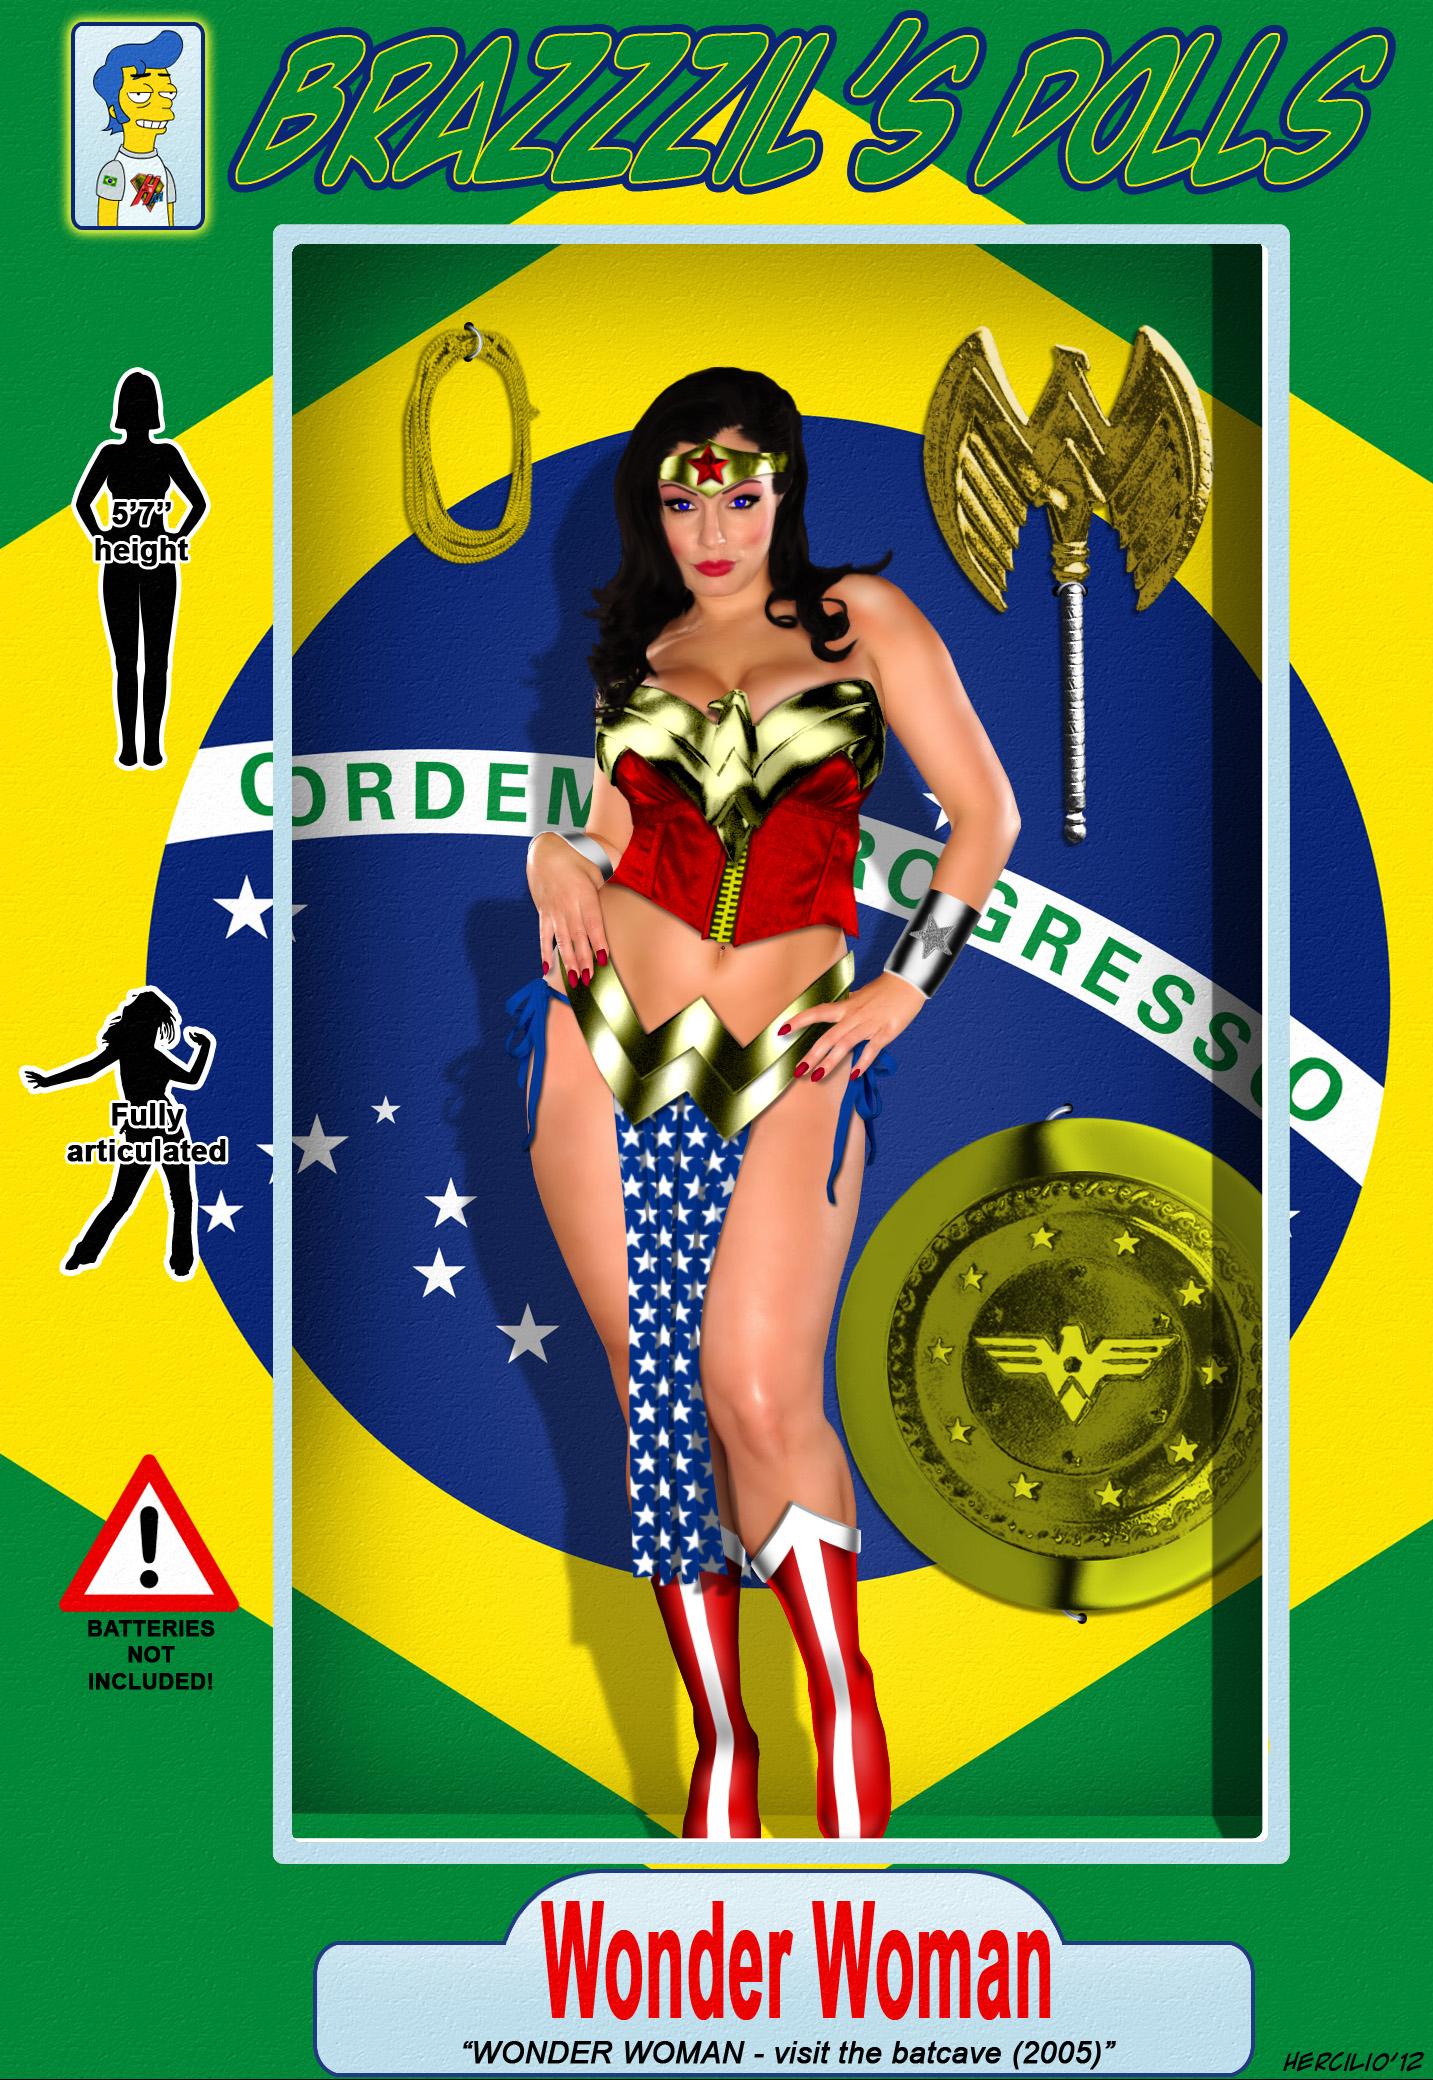 BRaZZZil's Dolls Wonder Woman